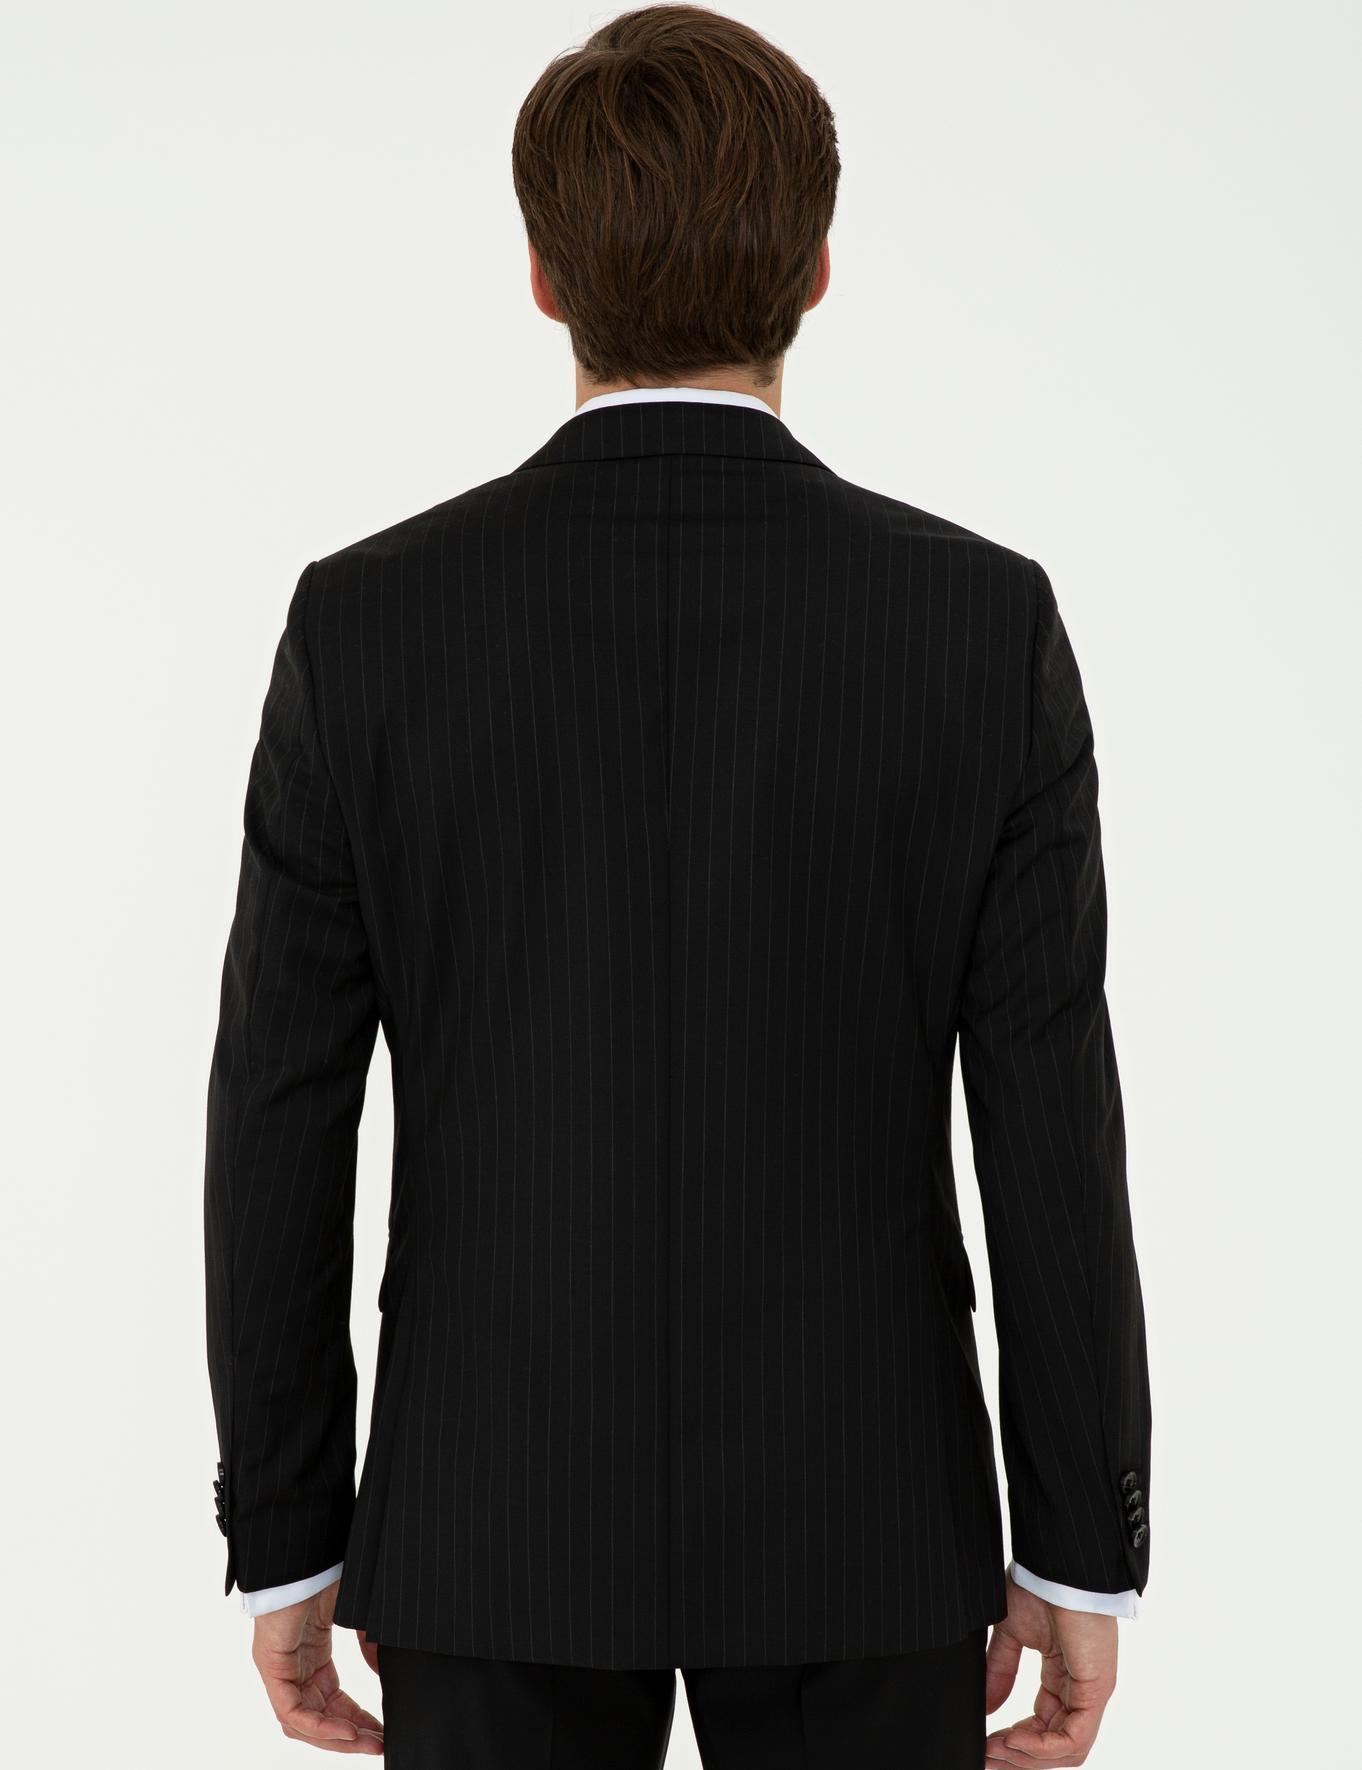 Siyah Slim Fit Ceket - 50238556047